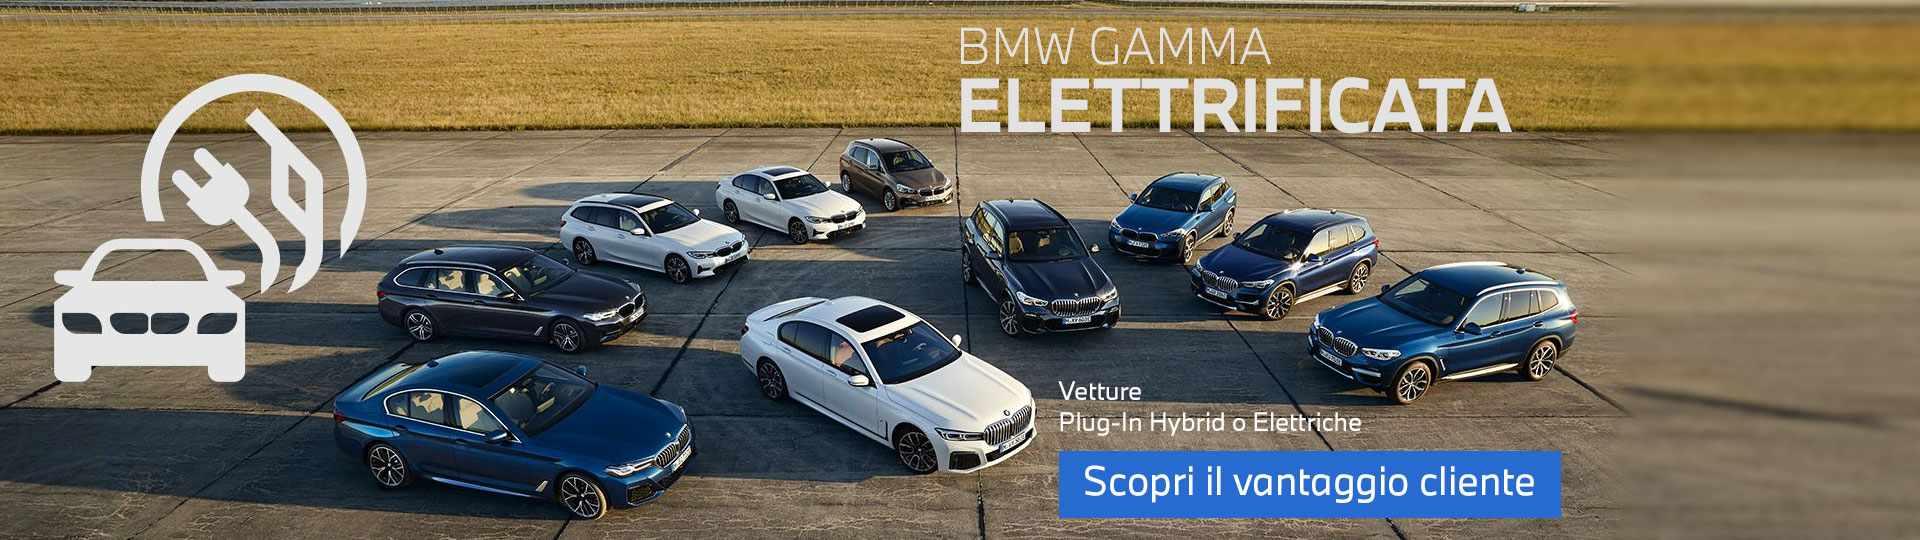 header_bmw_gamma_elettrificata_Marzo_2021.jpg